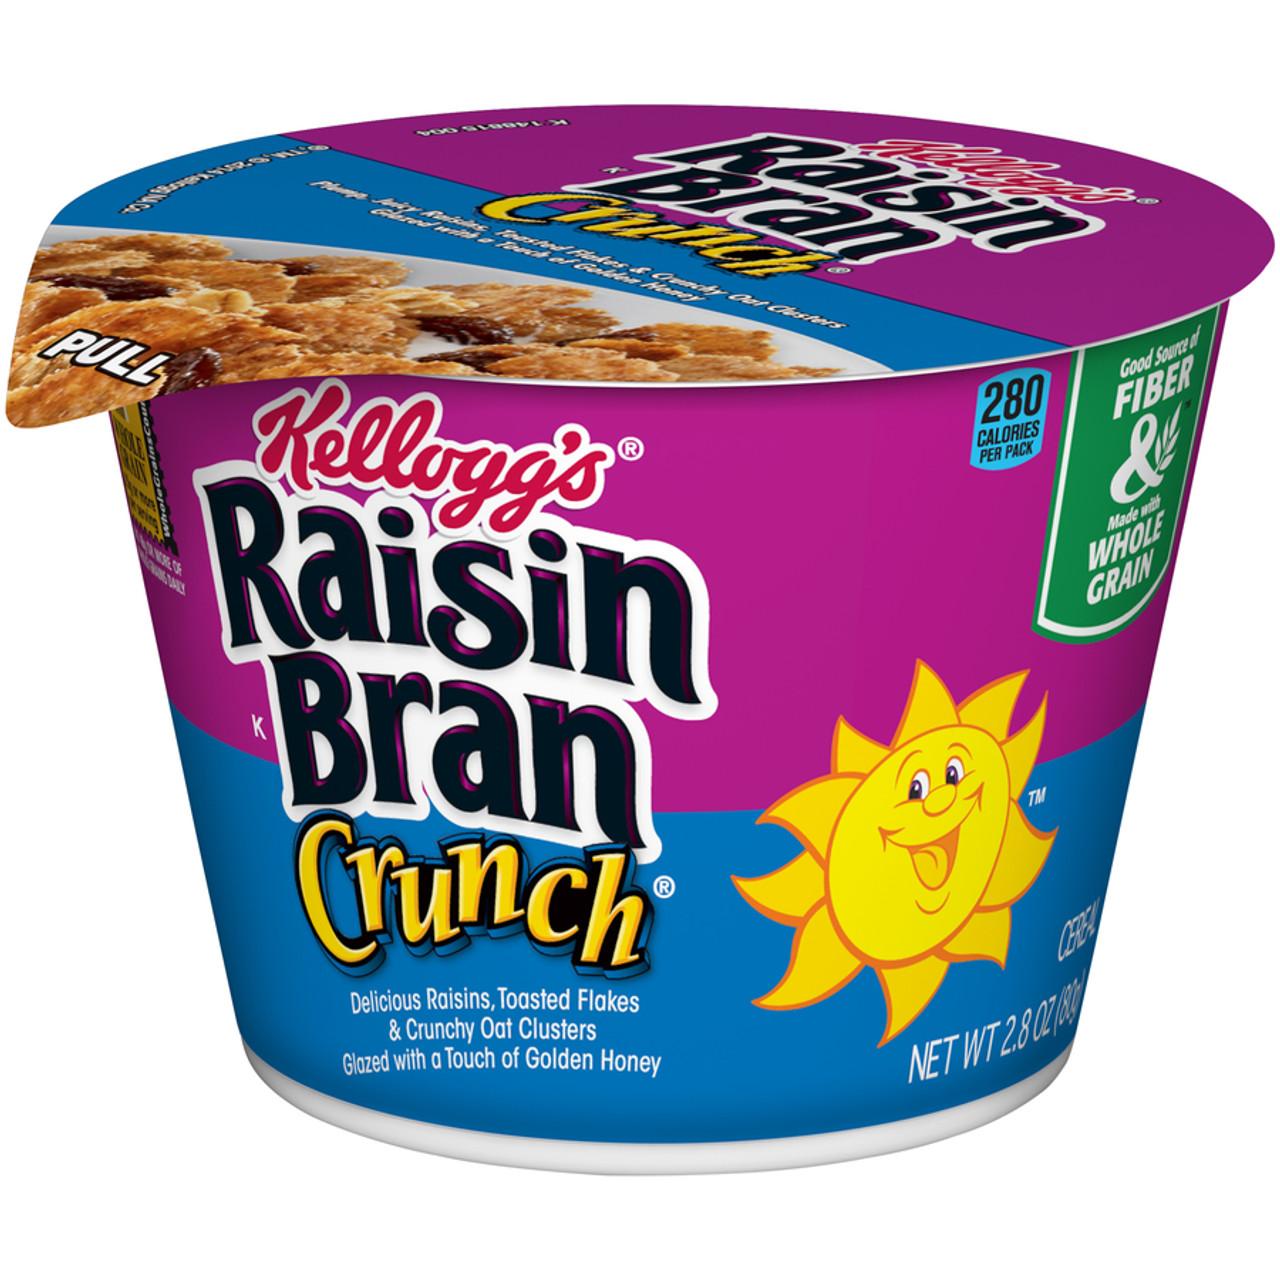 Kellogg's Cereal In A Cup, Raisin Bran Crunch, 2.8 Oz